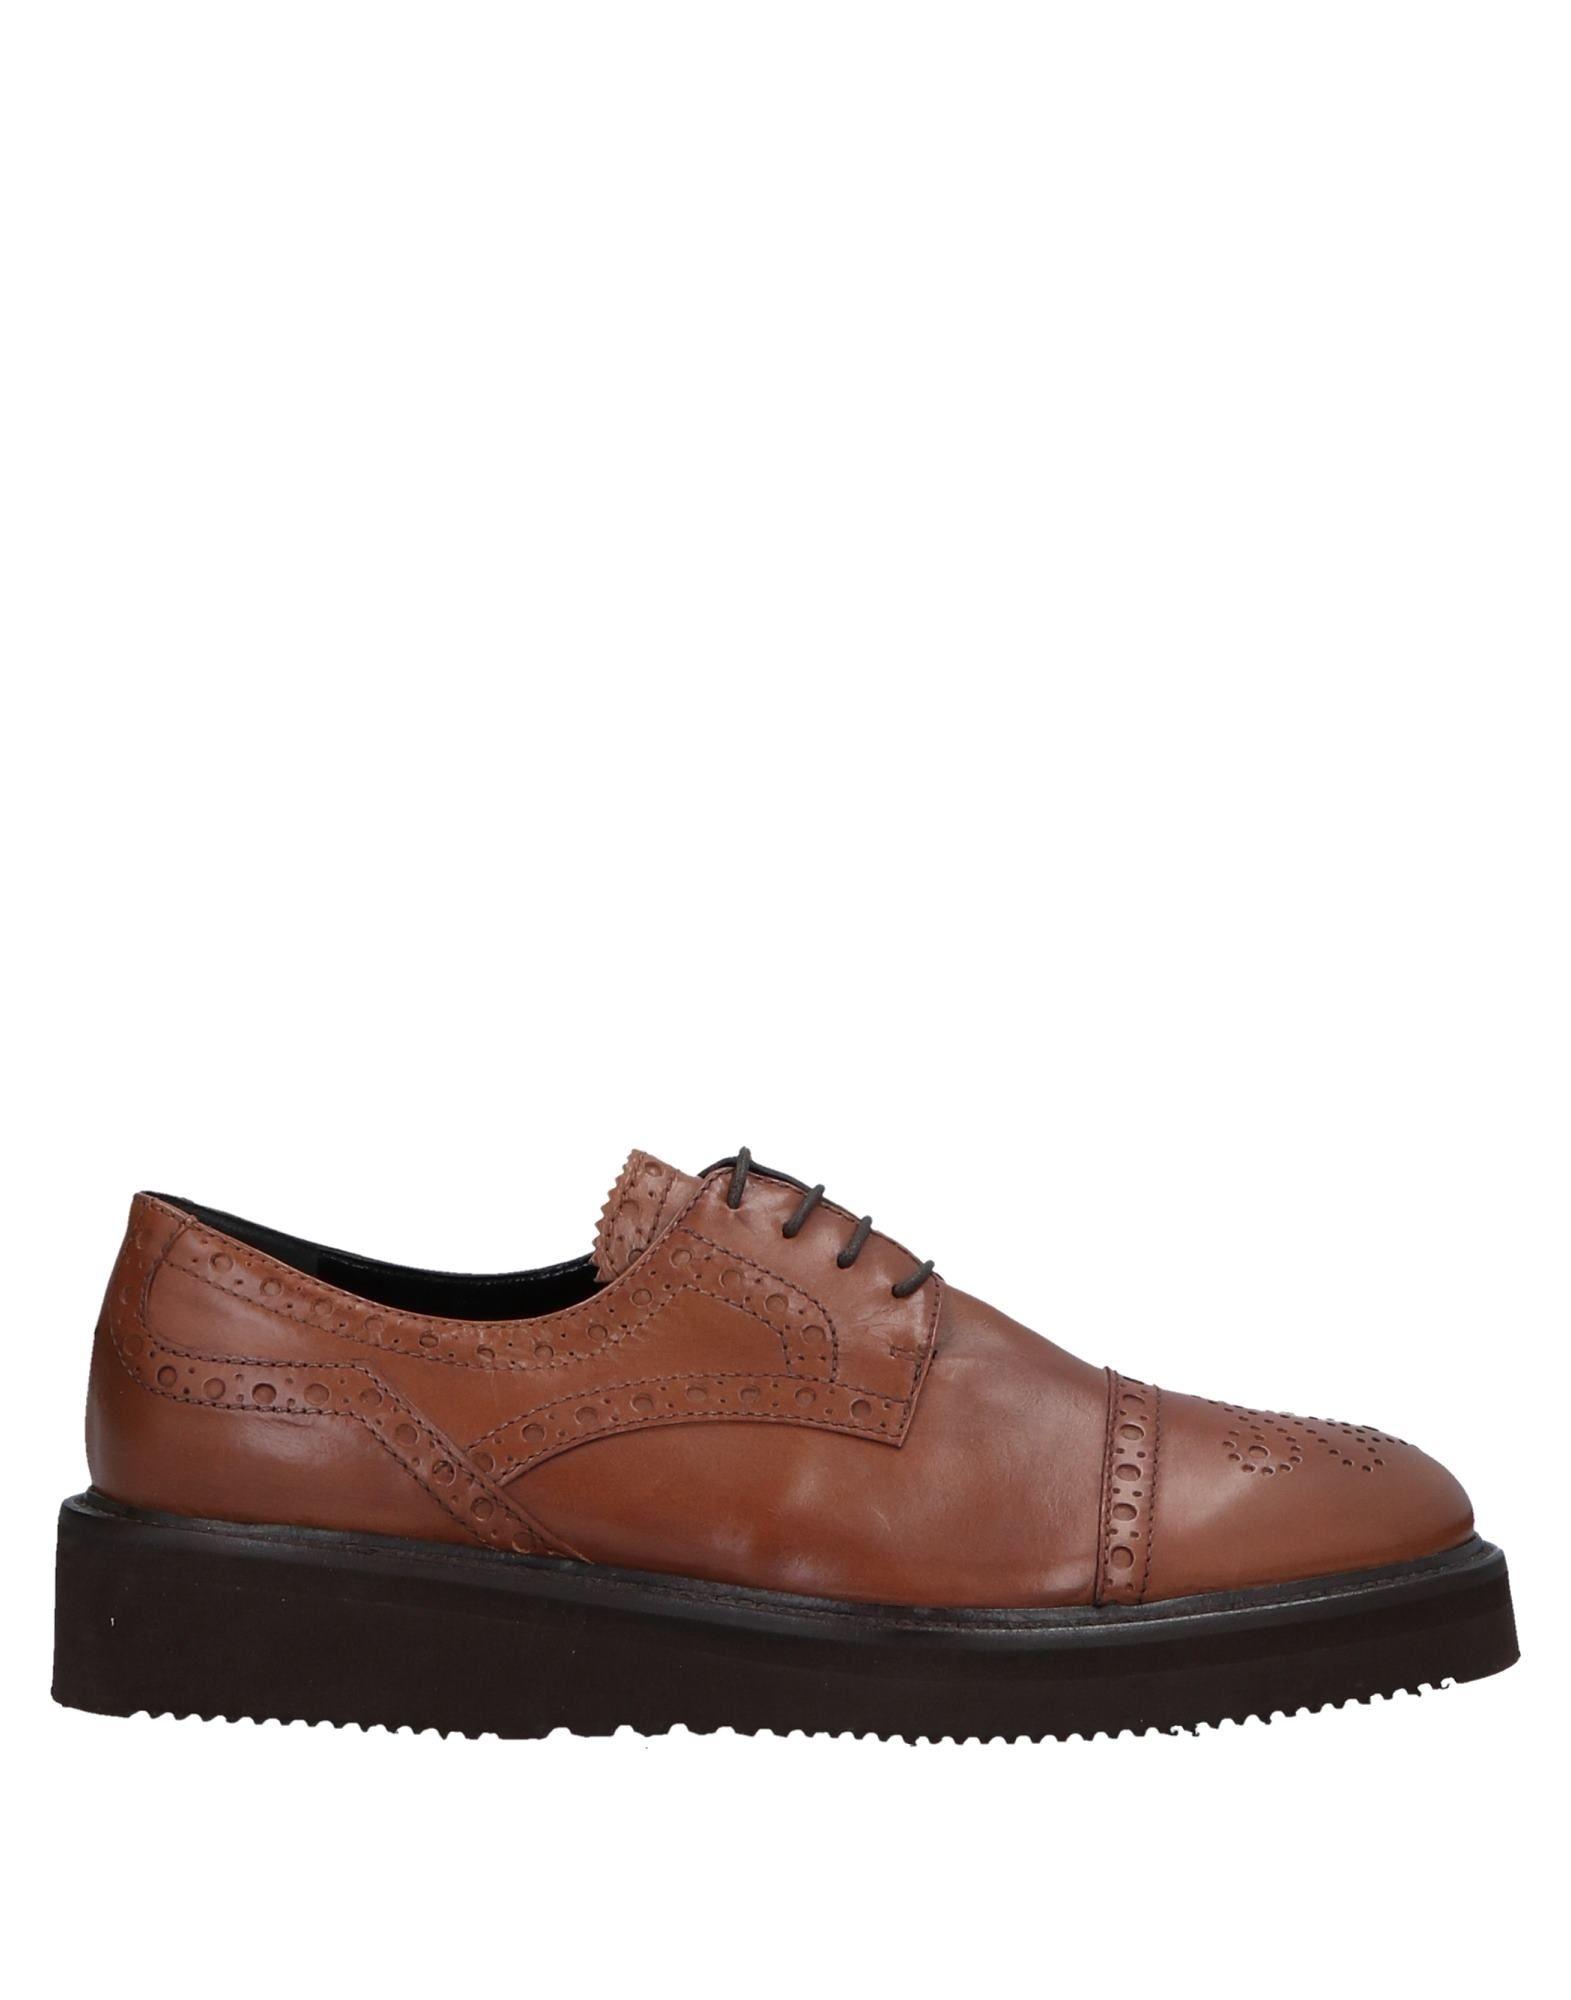 MARIA CRISTINA Обувь на шнурках maria barcelo обувь на шнурках